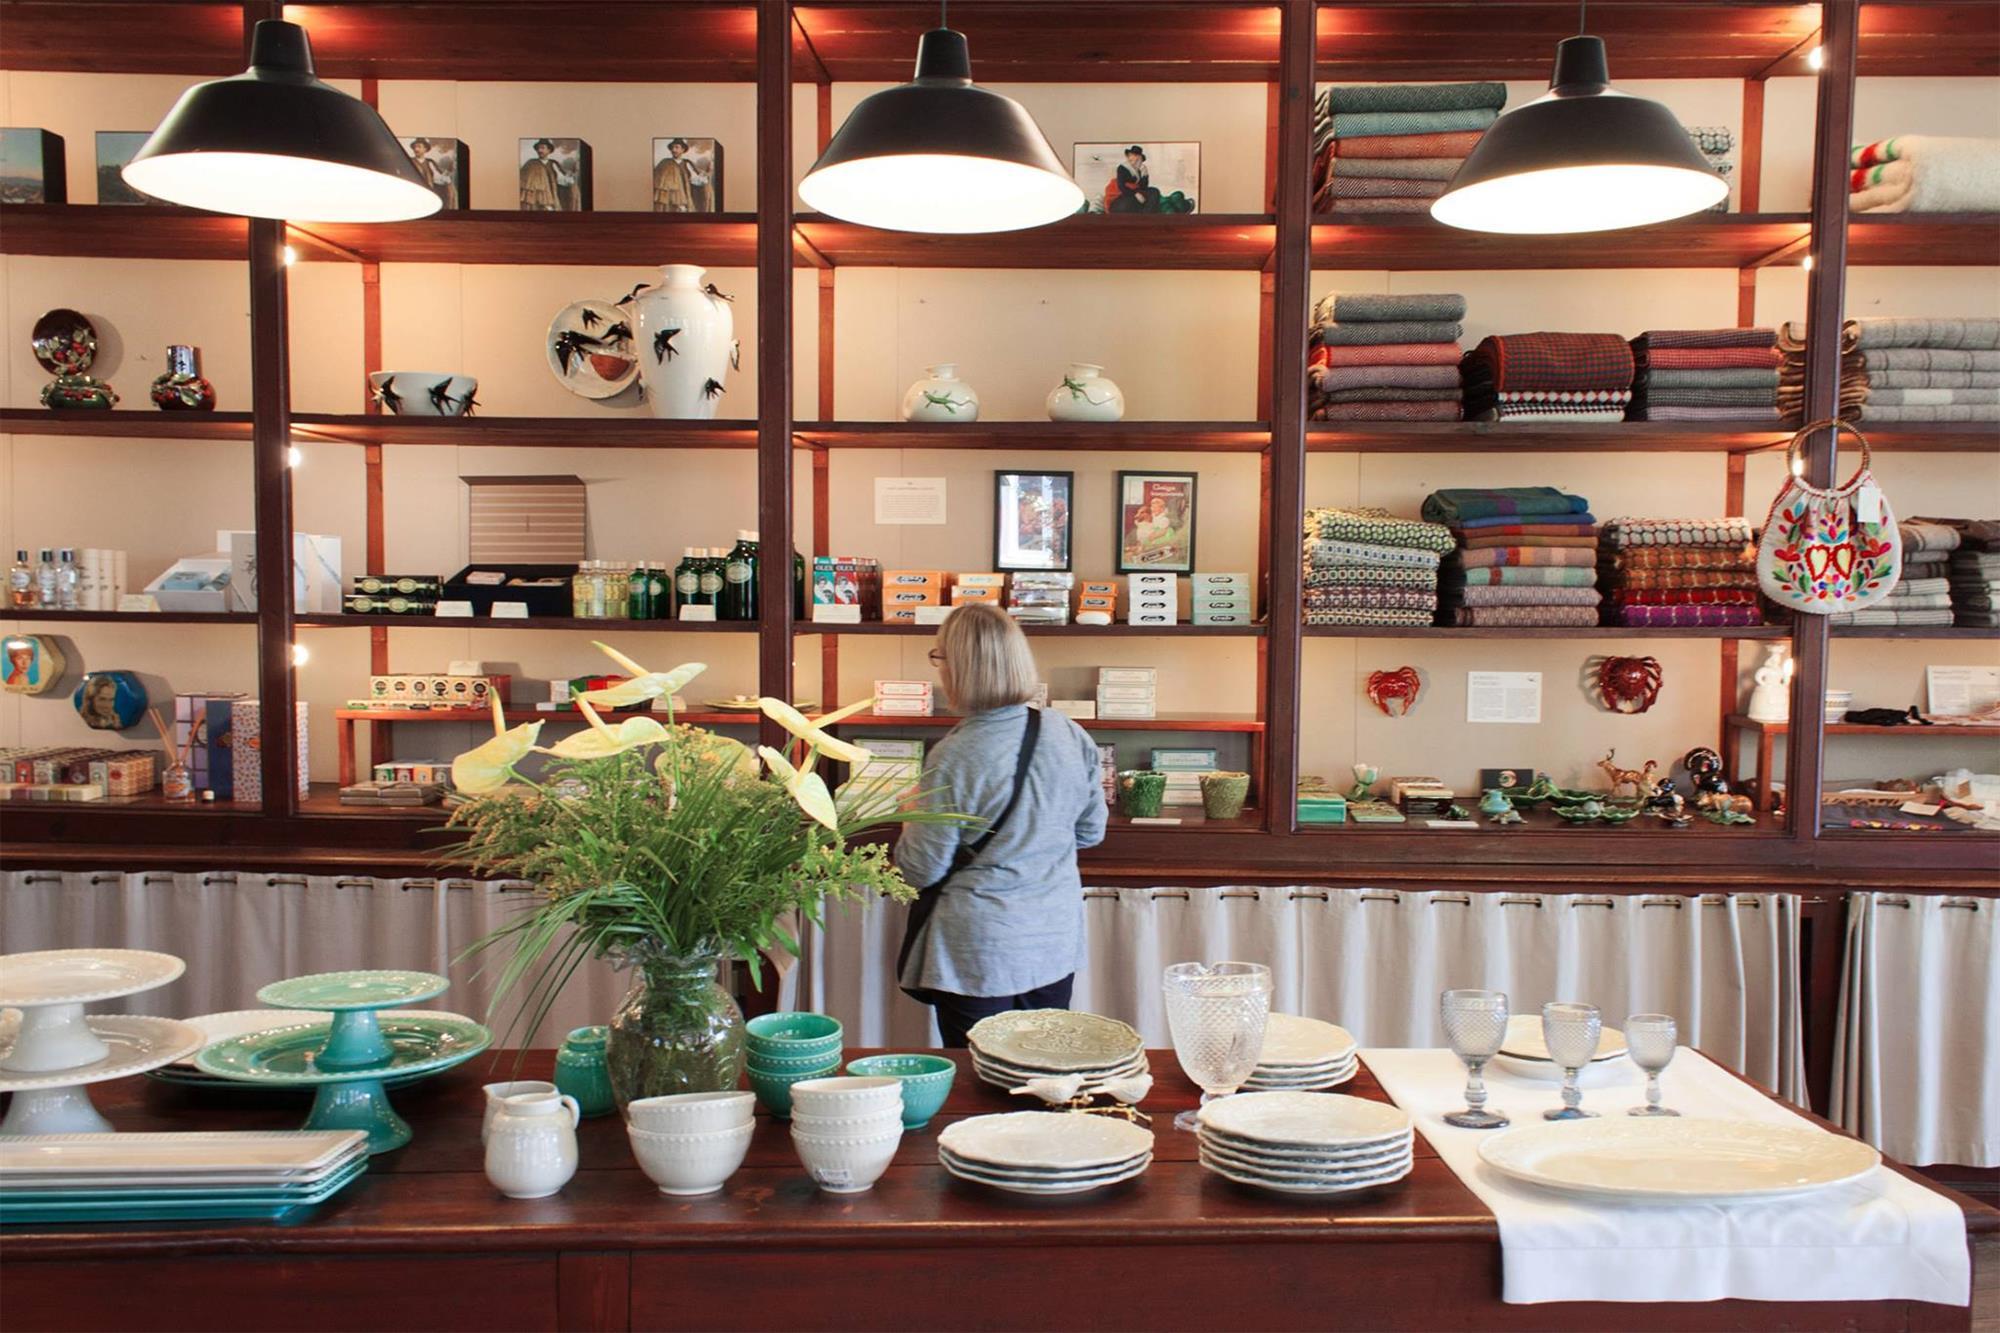 Tiendas de muebles en portugal best trendy good ofertas - Fabrica muebles portugal ...